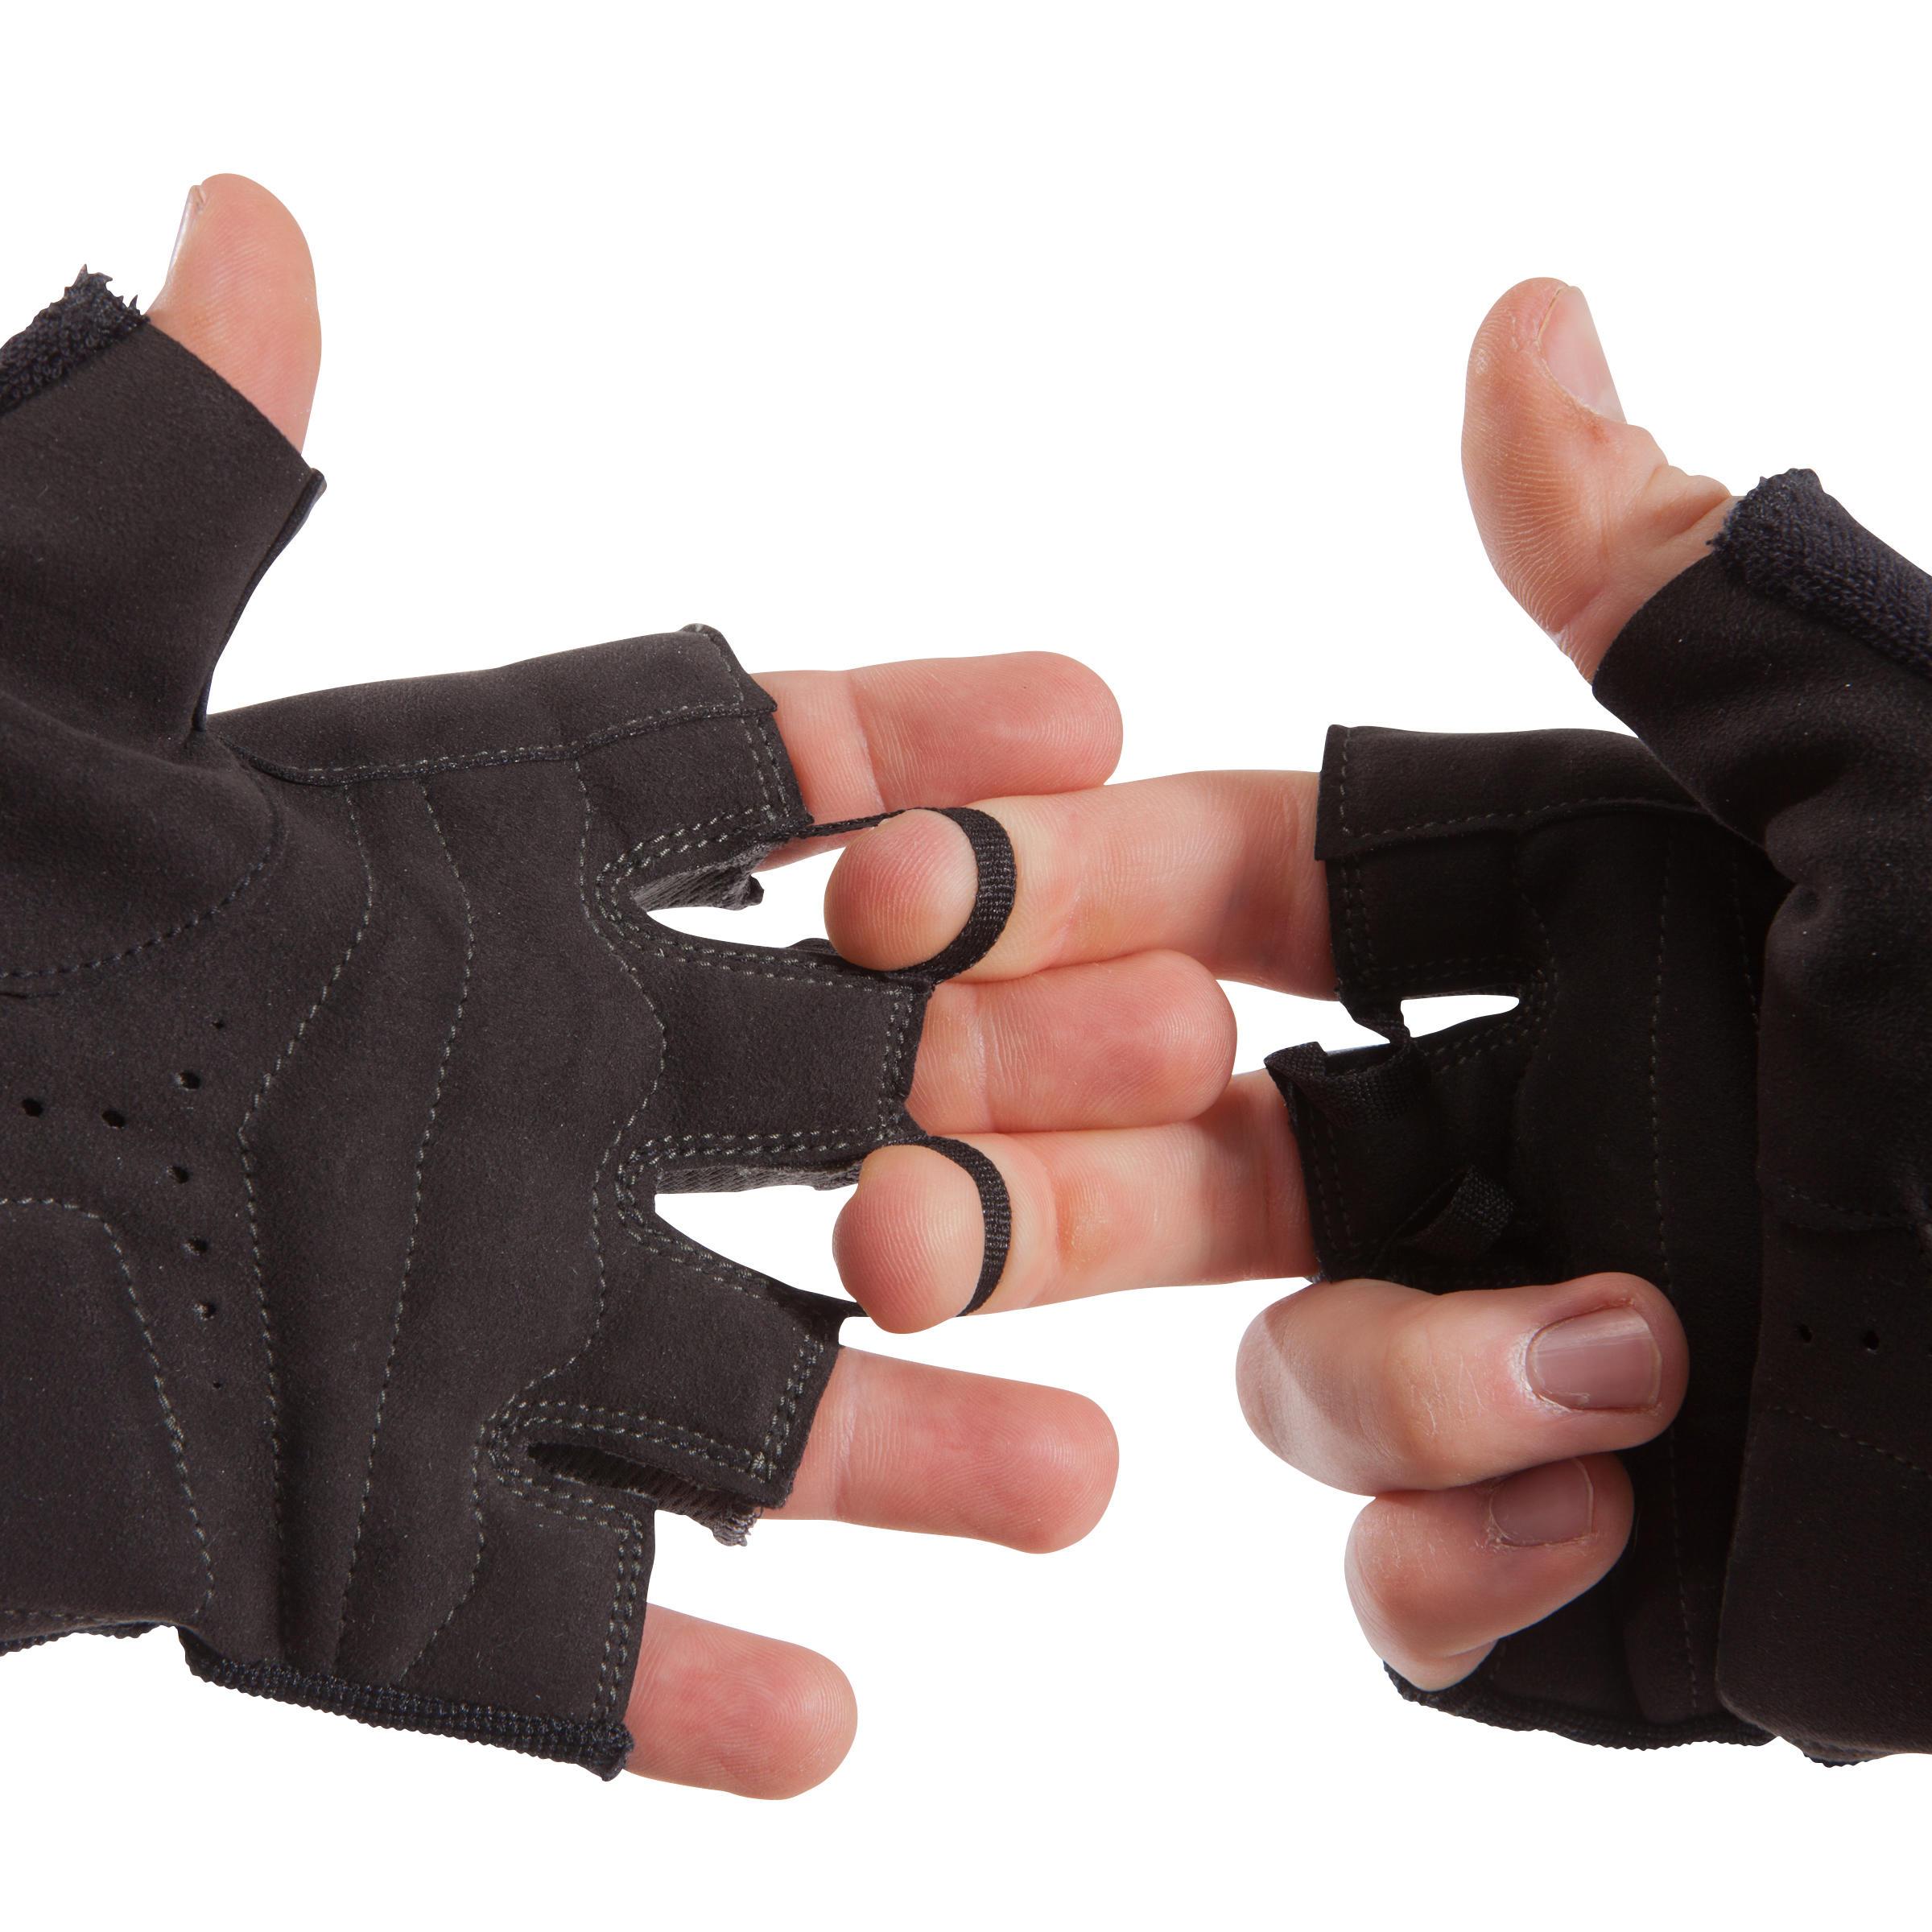 500 Weight Training Glove With Rip-Tab Cuff - Black/Khaki